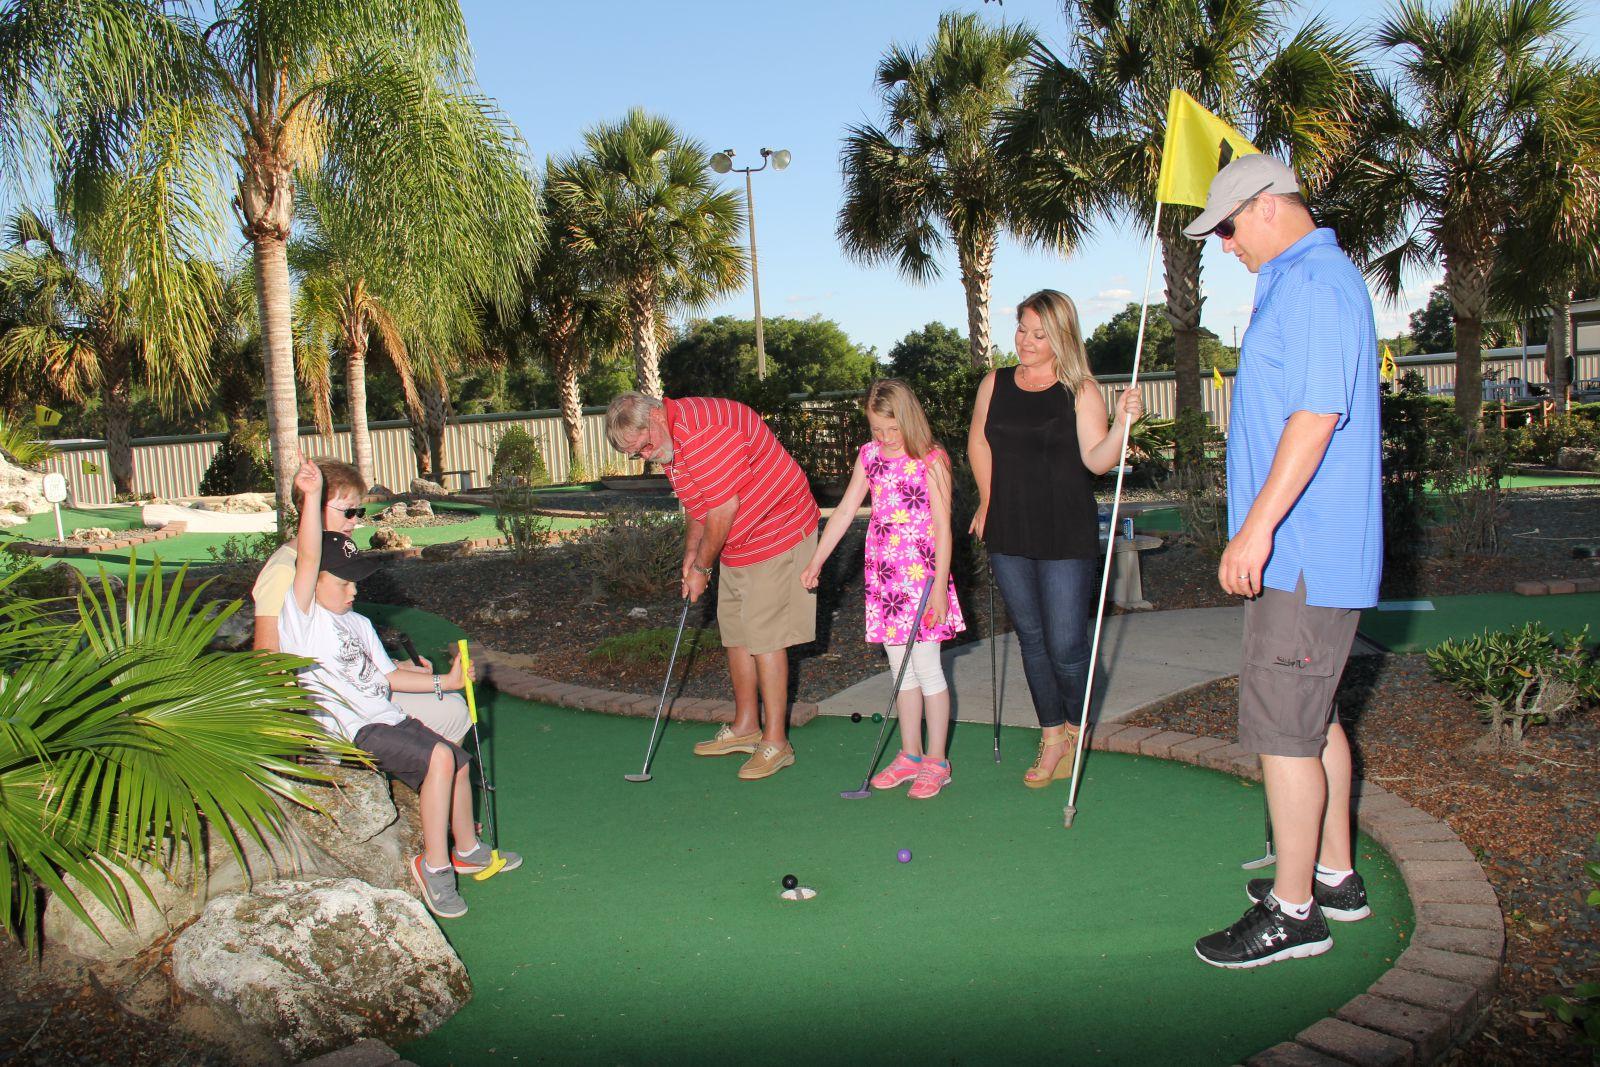 Tree Tops Golf Miniature Golf Course Designs Bats on